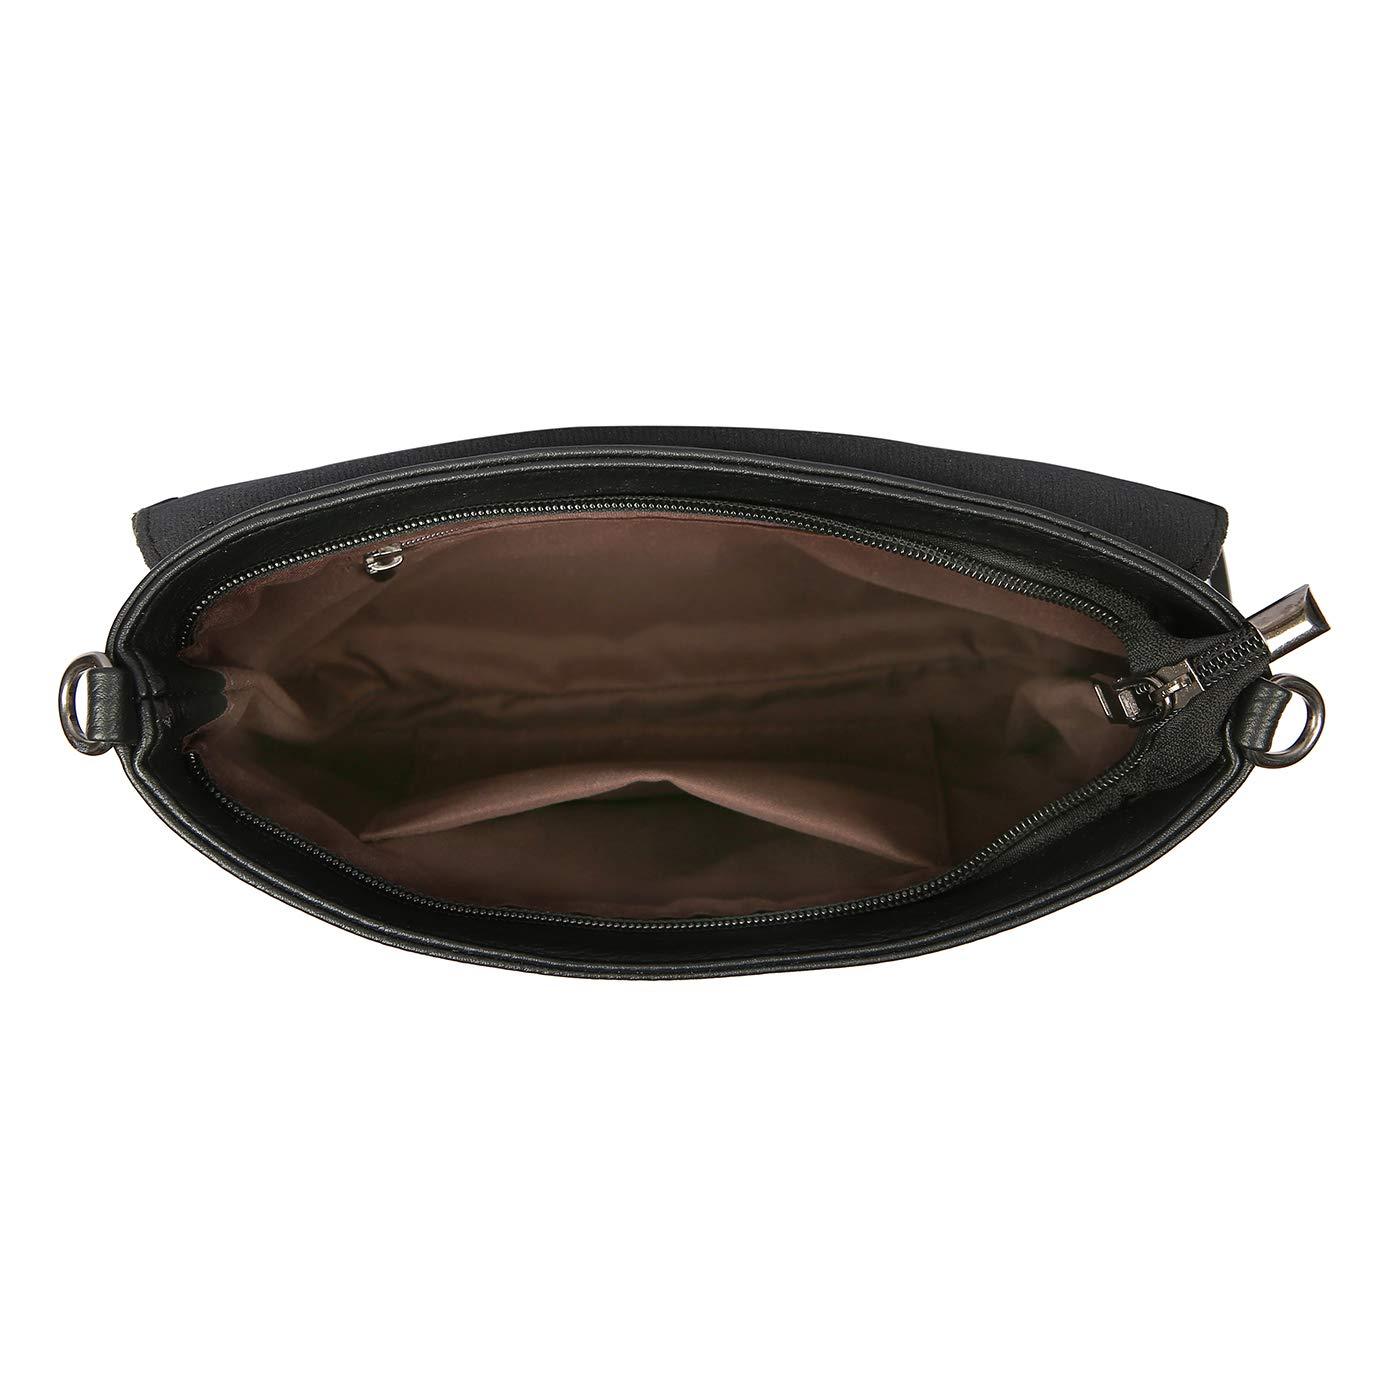 5ca1d7d52bb1 Amazon.com  HDE Women s PU Leather Hobo Fringe Crossbody Tassel Purse  Vintage Small Handbag  Shoes